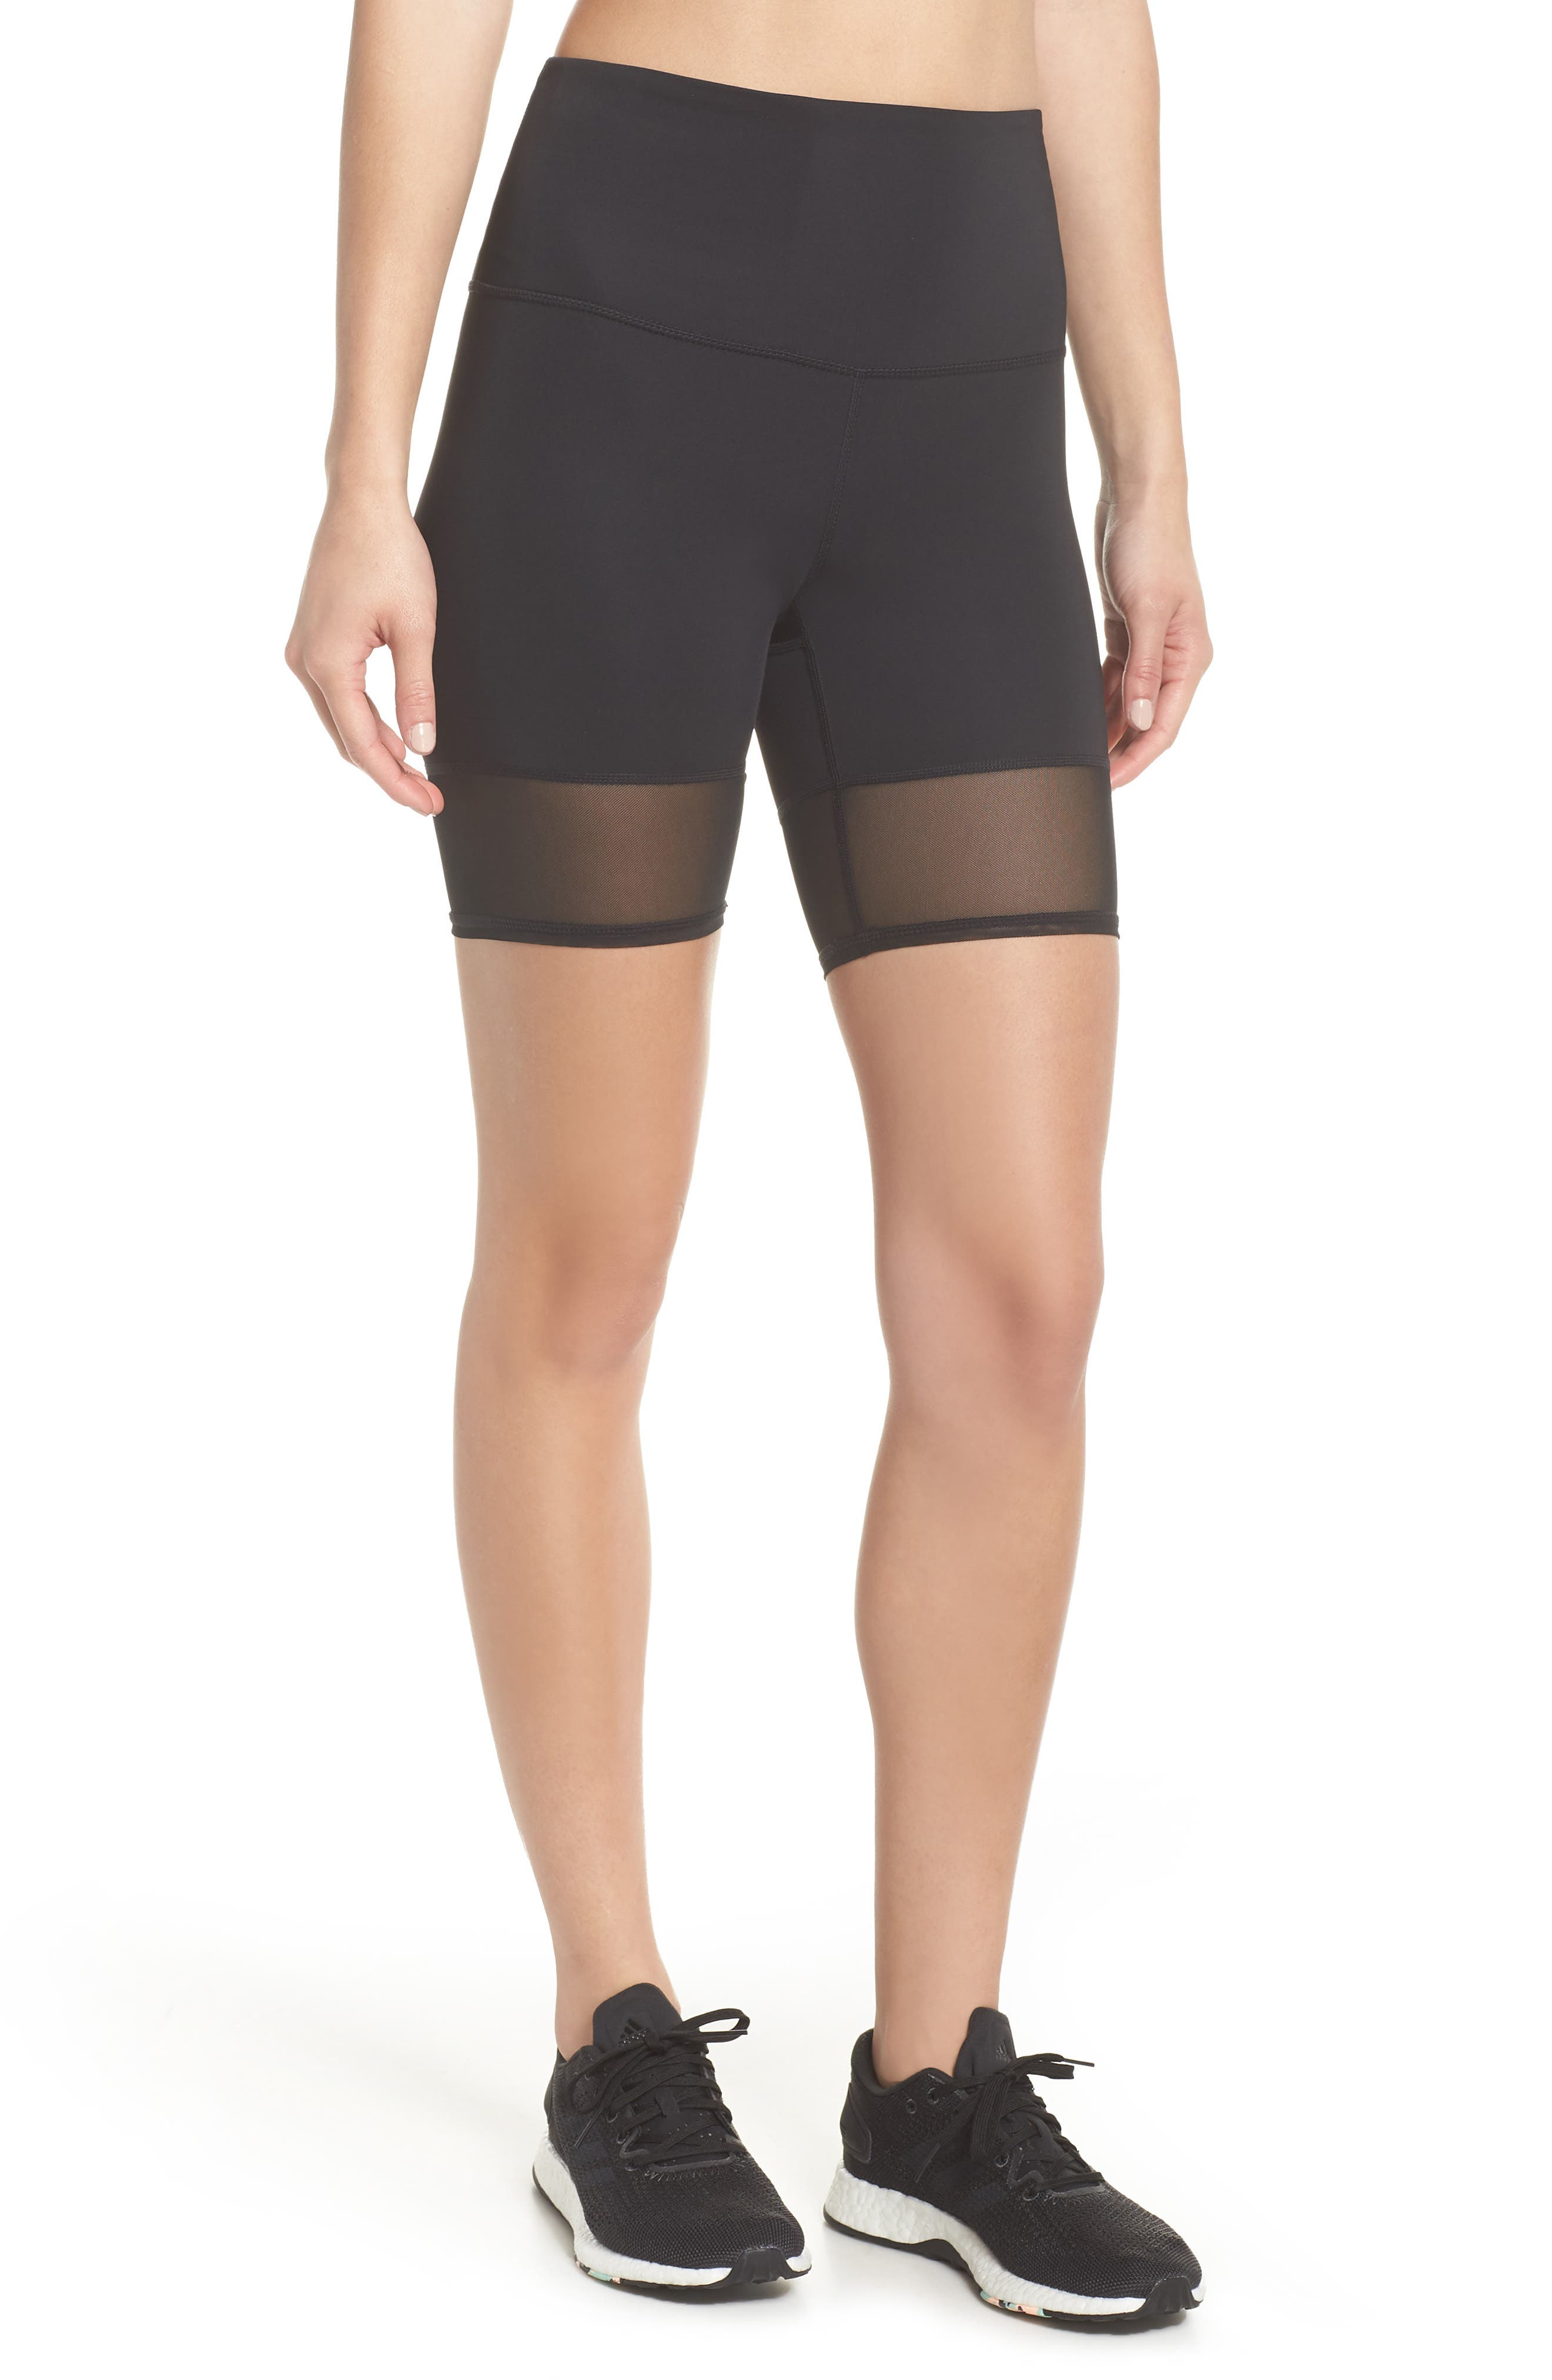 Mia Vision High Waist Mesh Bike Shorts,                         Main,                         color, Black